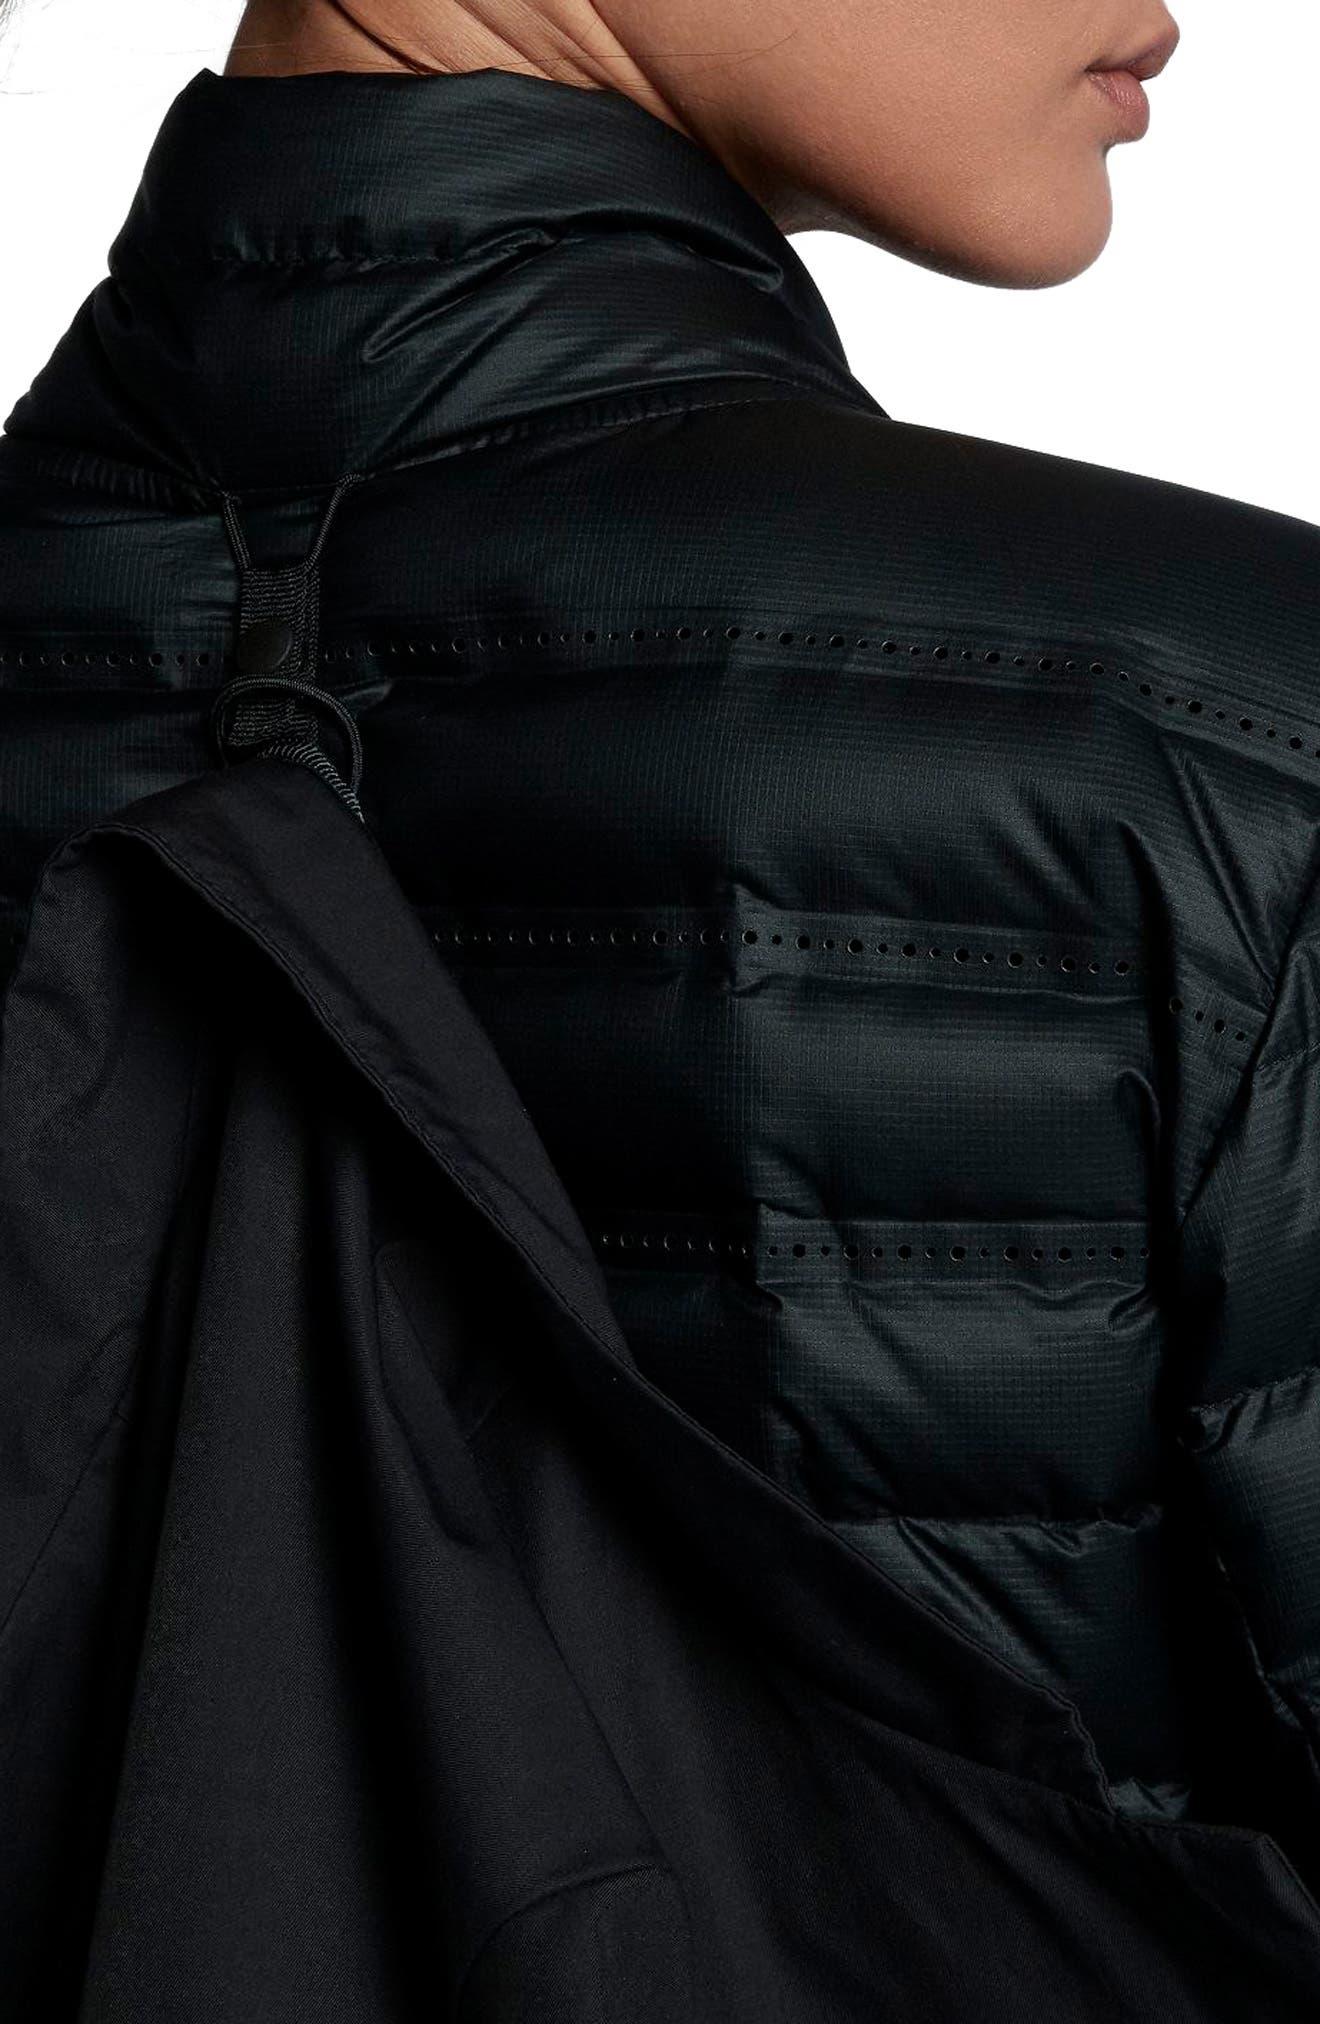 Sportswear AeroLoft 3-in-1 Down Jacket,                             Alternate thumbnail 7, color,                             Black/ Black/ Black